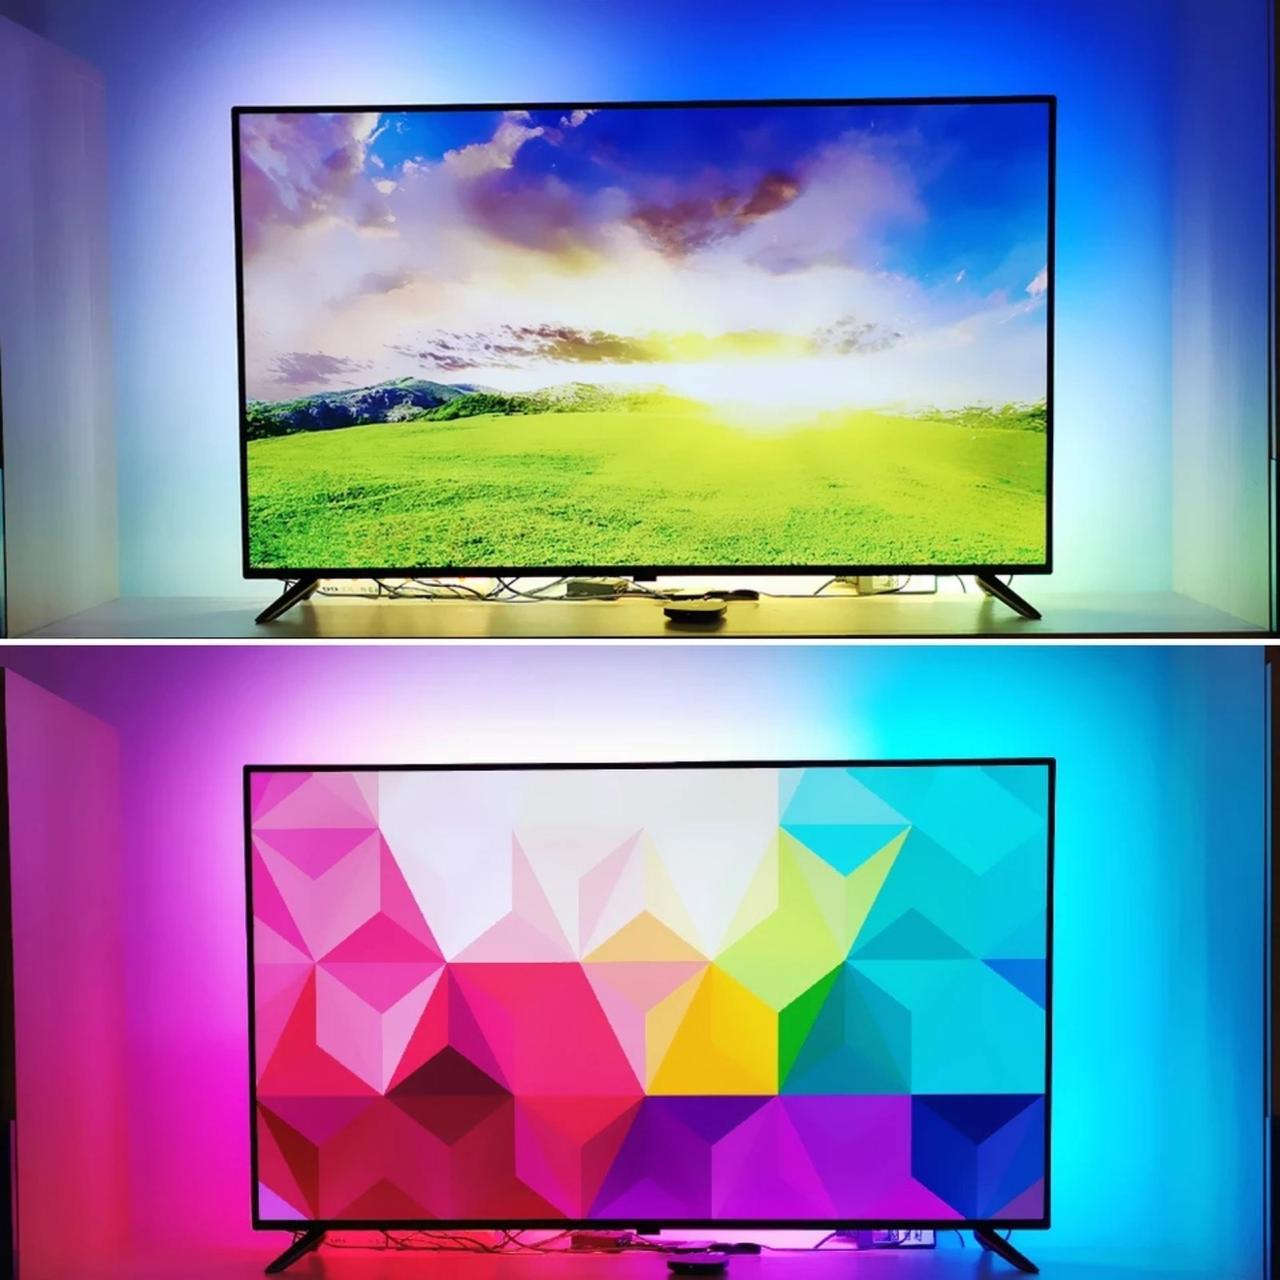 1 метр Интерактивная подсветка на 30светодиодов/м Ambilight для Android-TV и ПК